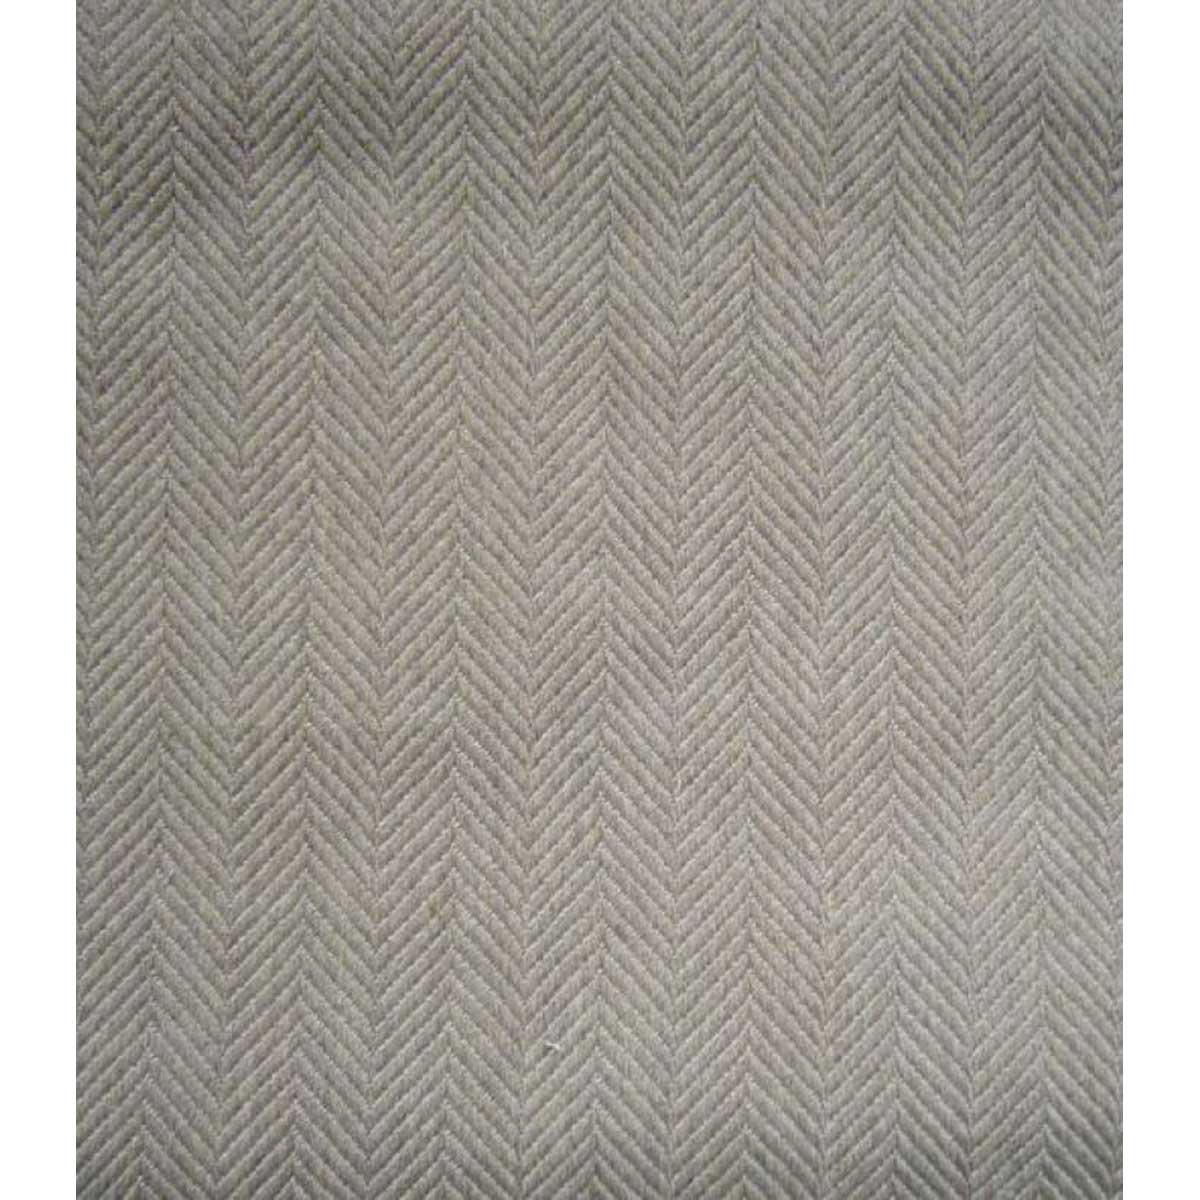 Tissu à tissage chevrons - Gris clair - 2.8 m